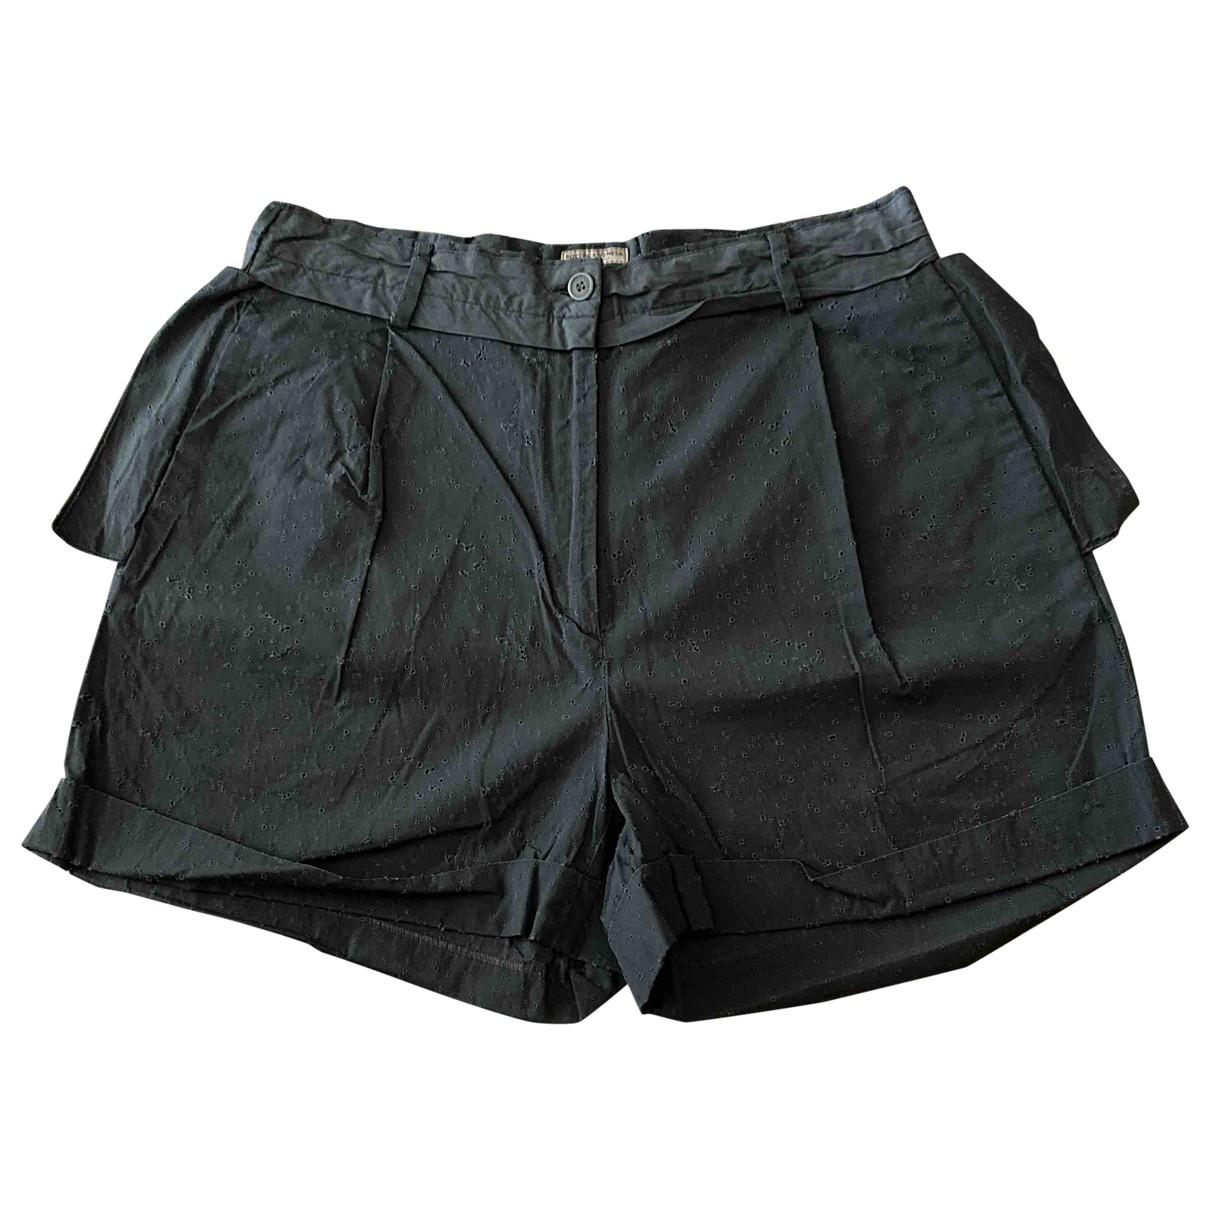 Bottega Veneta \N Shorts in  Grau Baumwolle